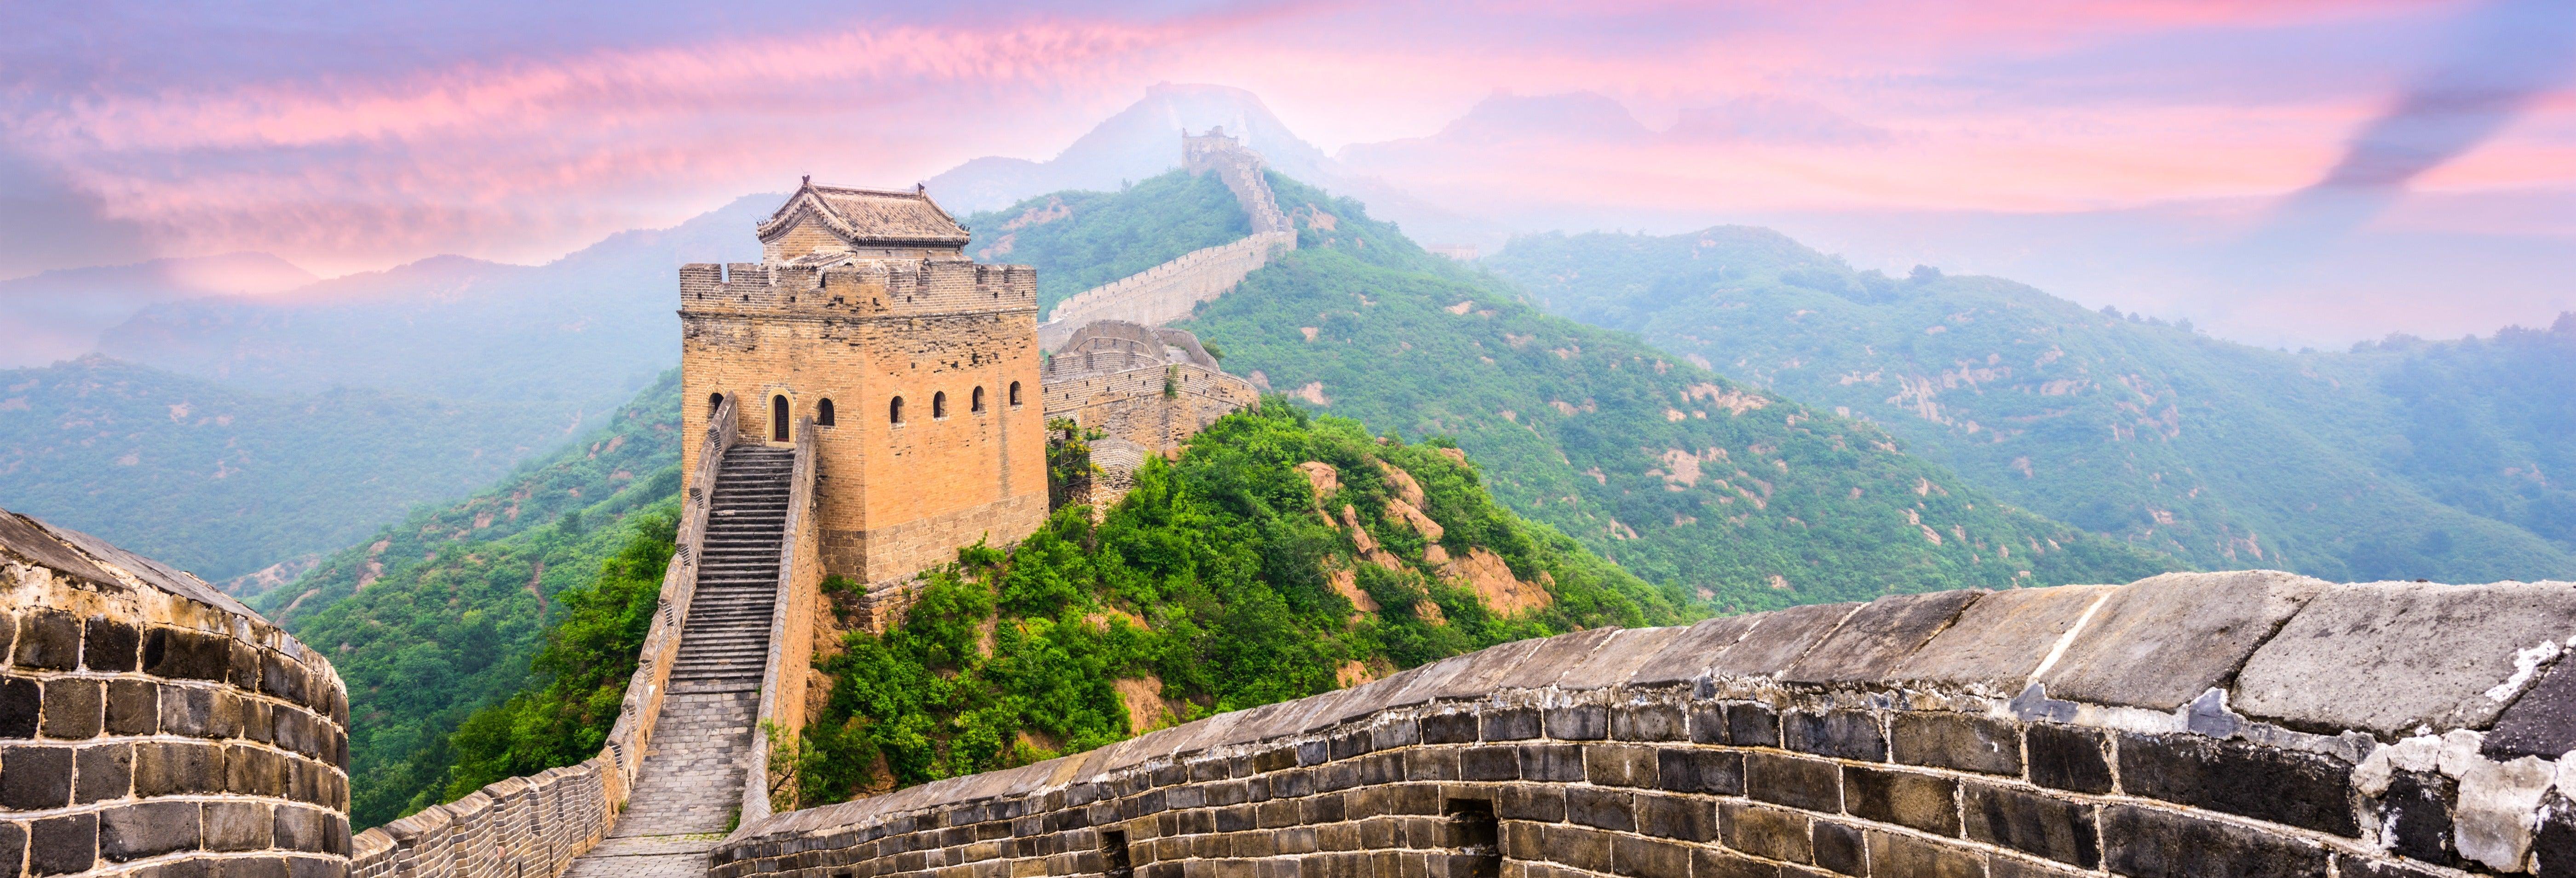 Jinshanling Great Wall Hike